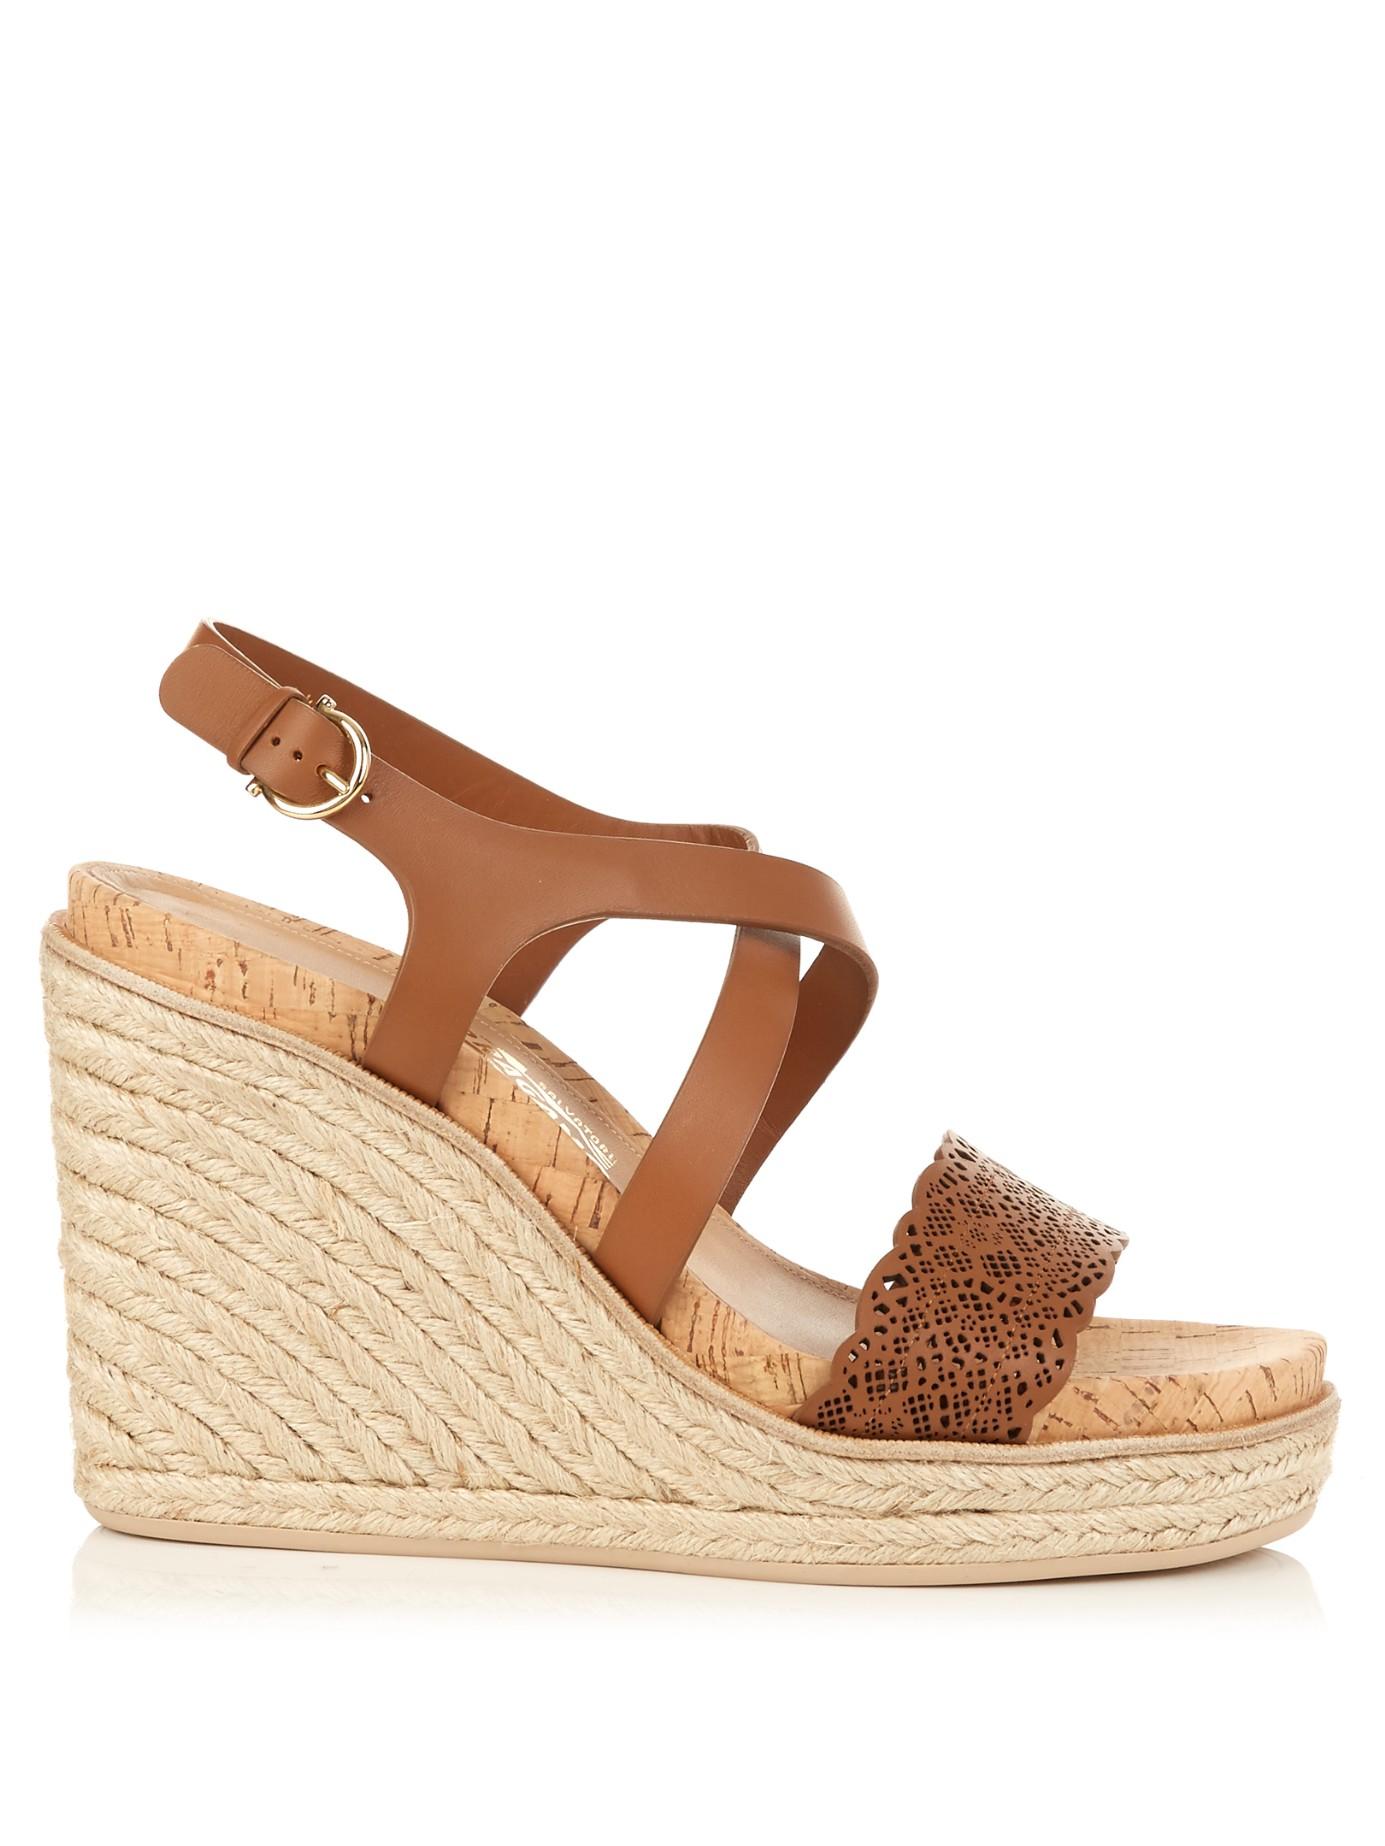 c5100f6c66f Ferragamo Gioela Espadrille Wedge Sandals in Brown - Lyst